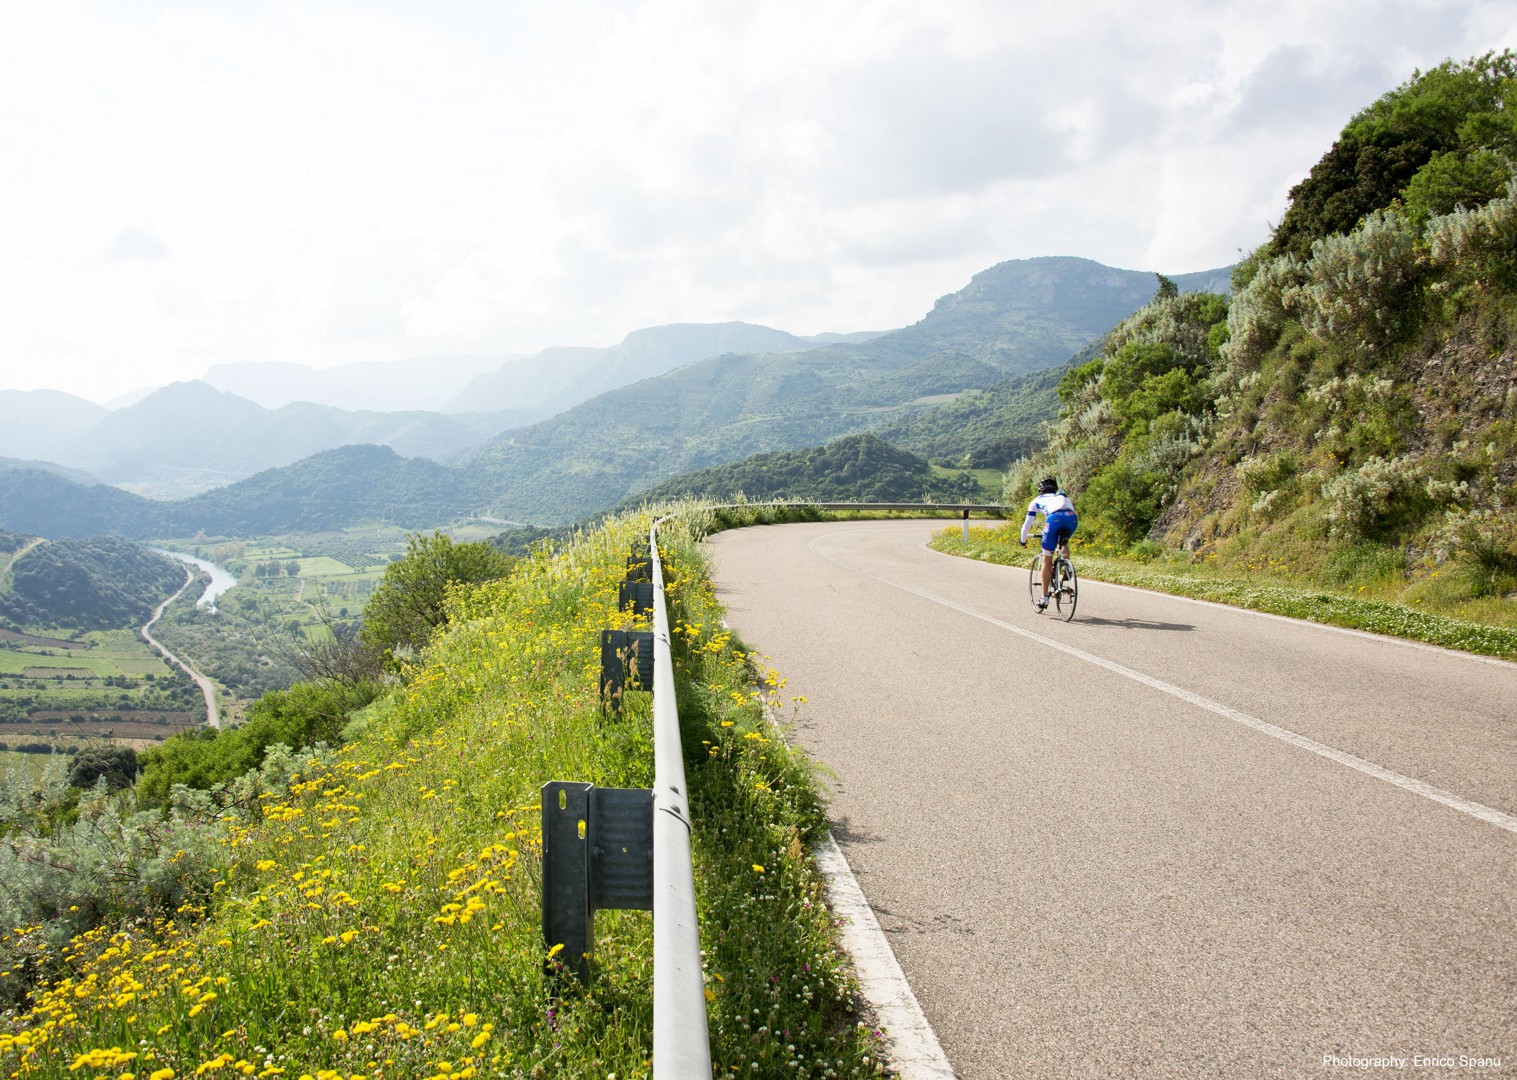 Sardinia-Sardinian-Mountains-Guided-Road-Cycling-Holiday-Mediterranean-gem.jpg - Italy - Sardinia - Mountain Explorer - Guided Road Cycling Holiday - Italia Road Cycling